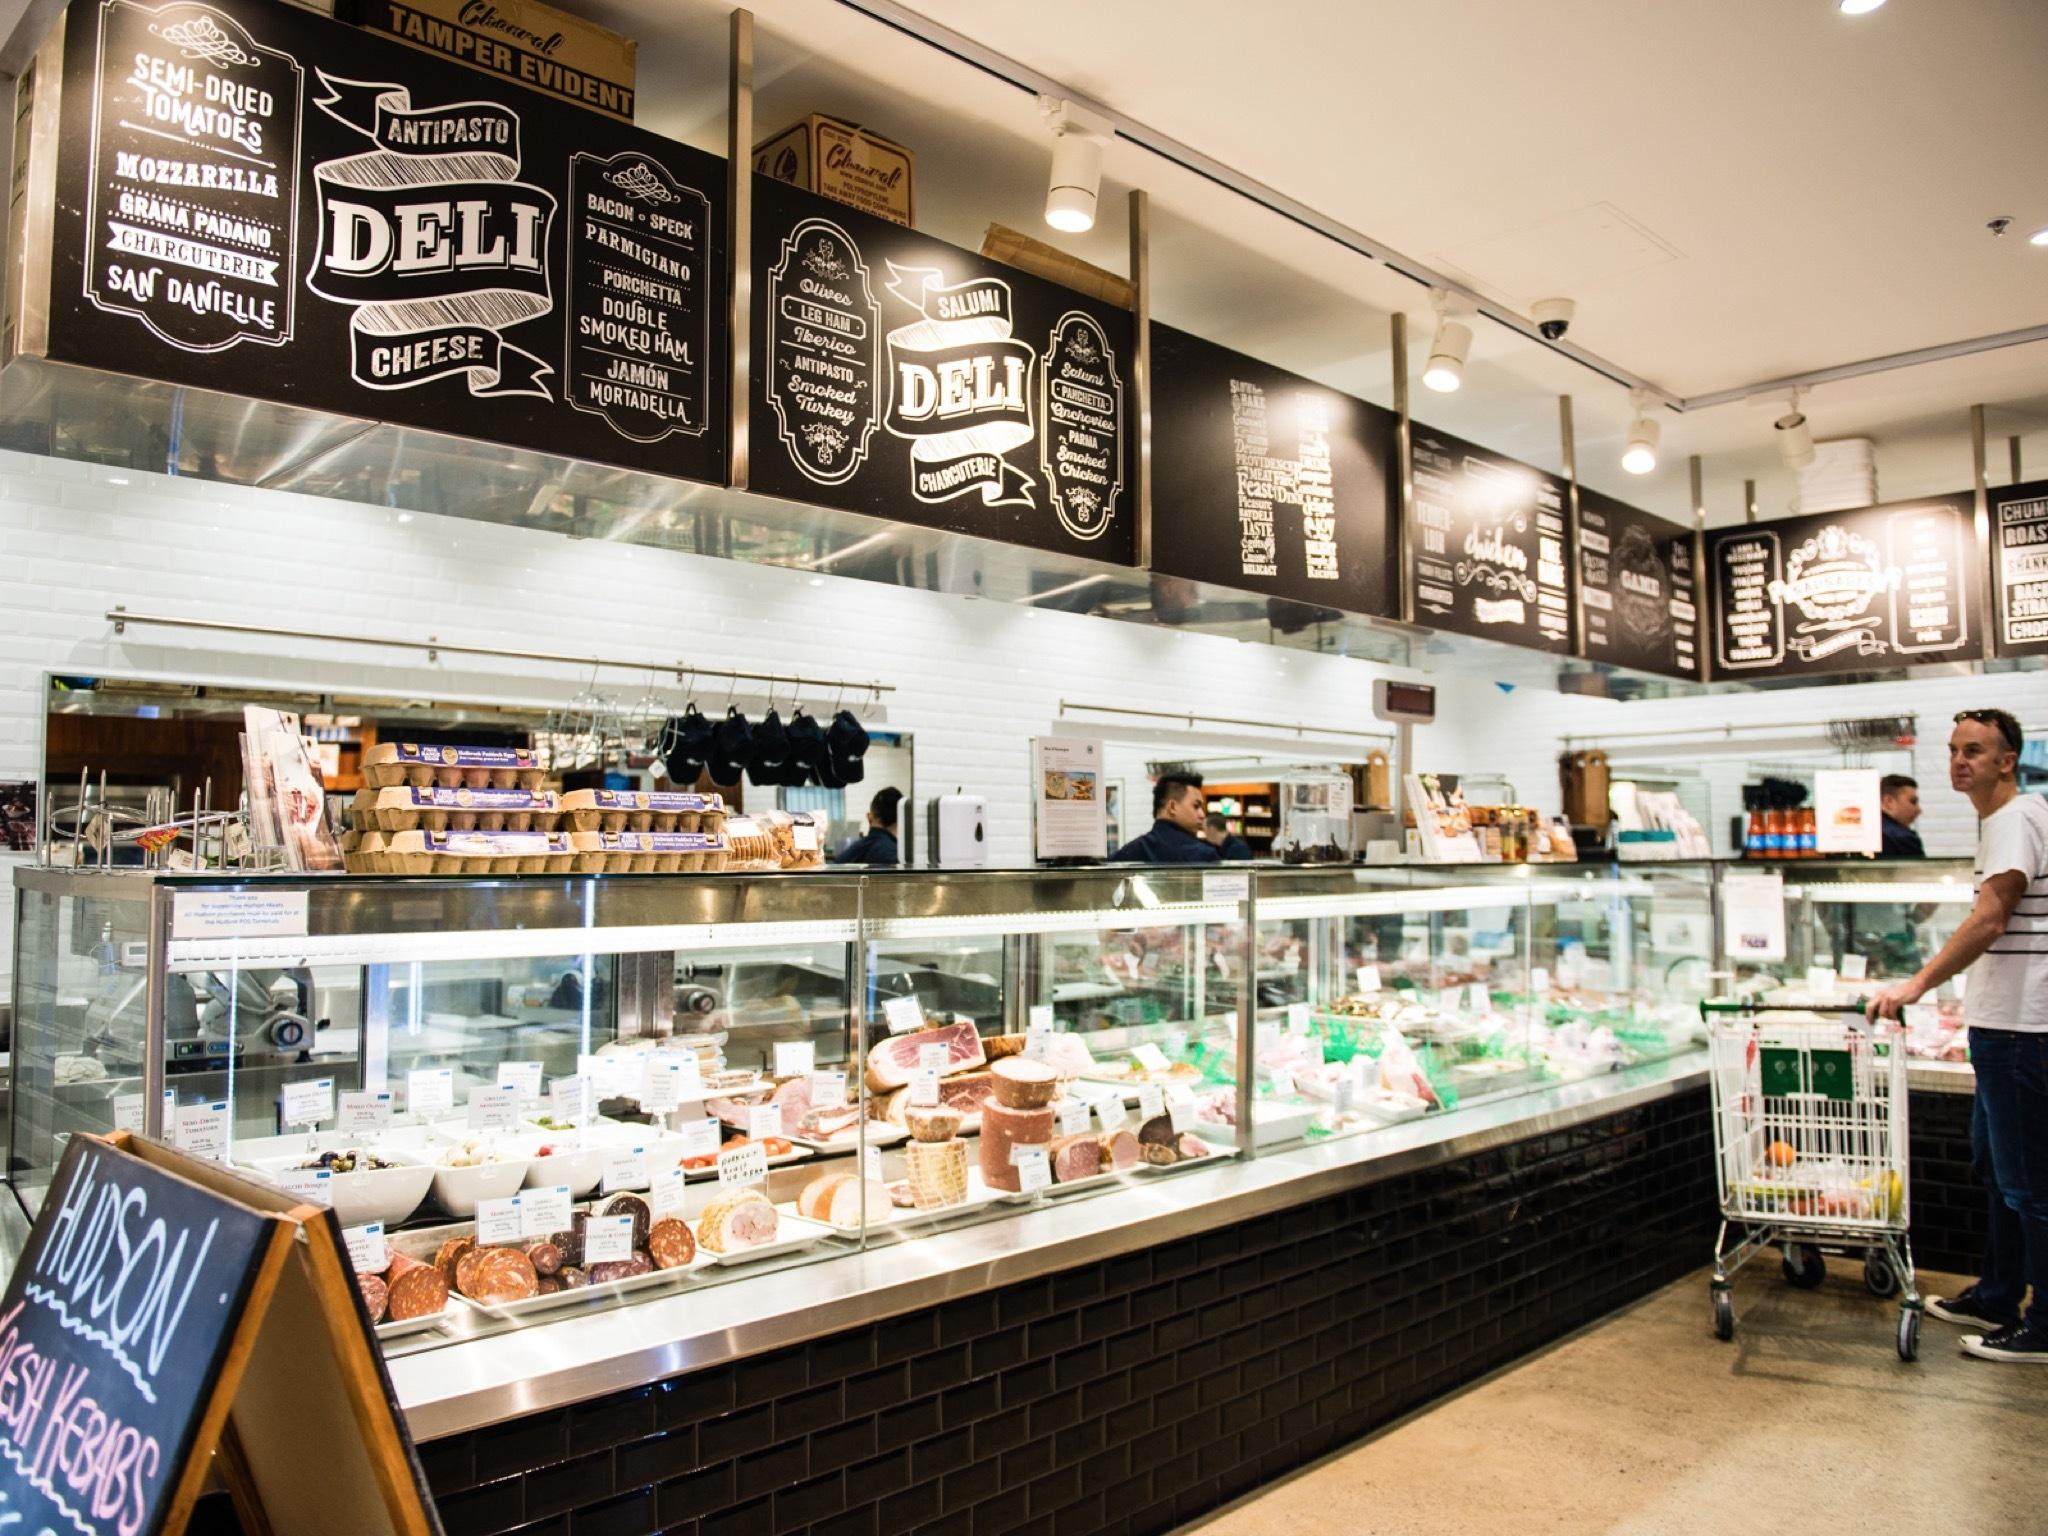 Counter displays at Hudson Meats